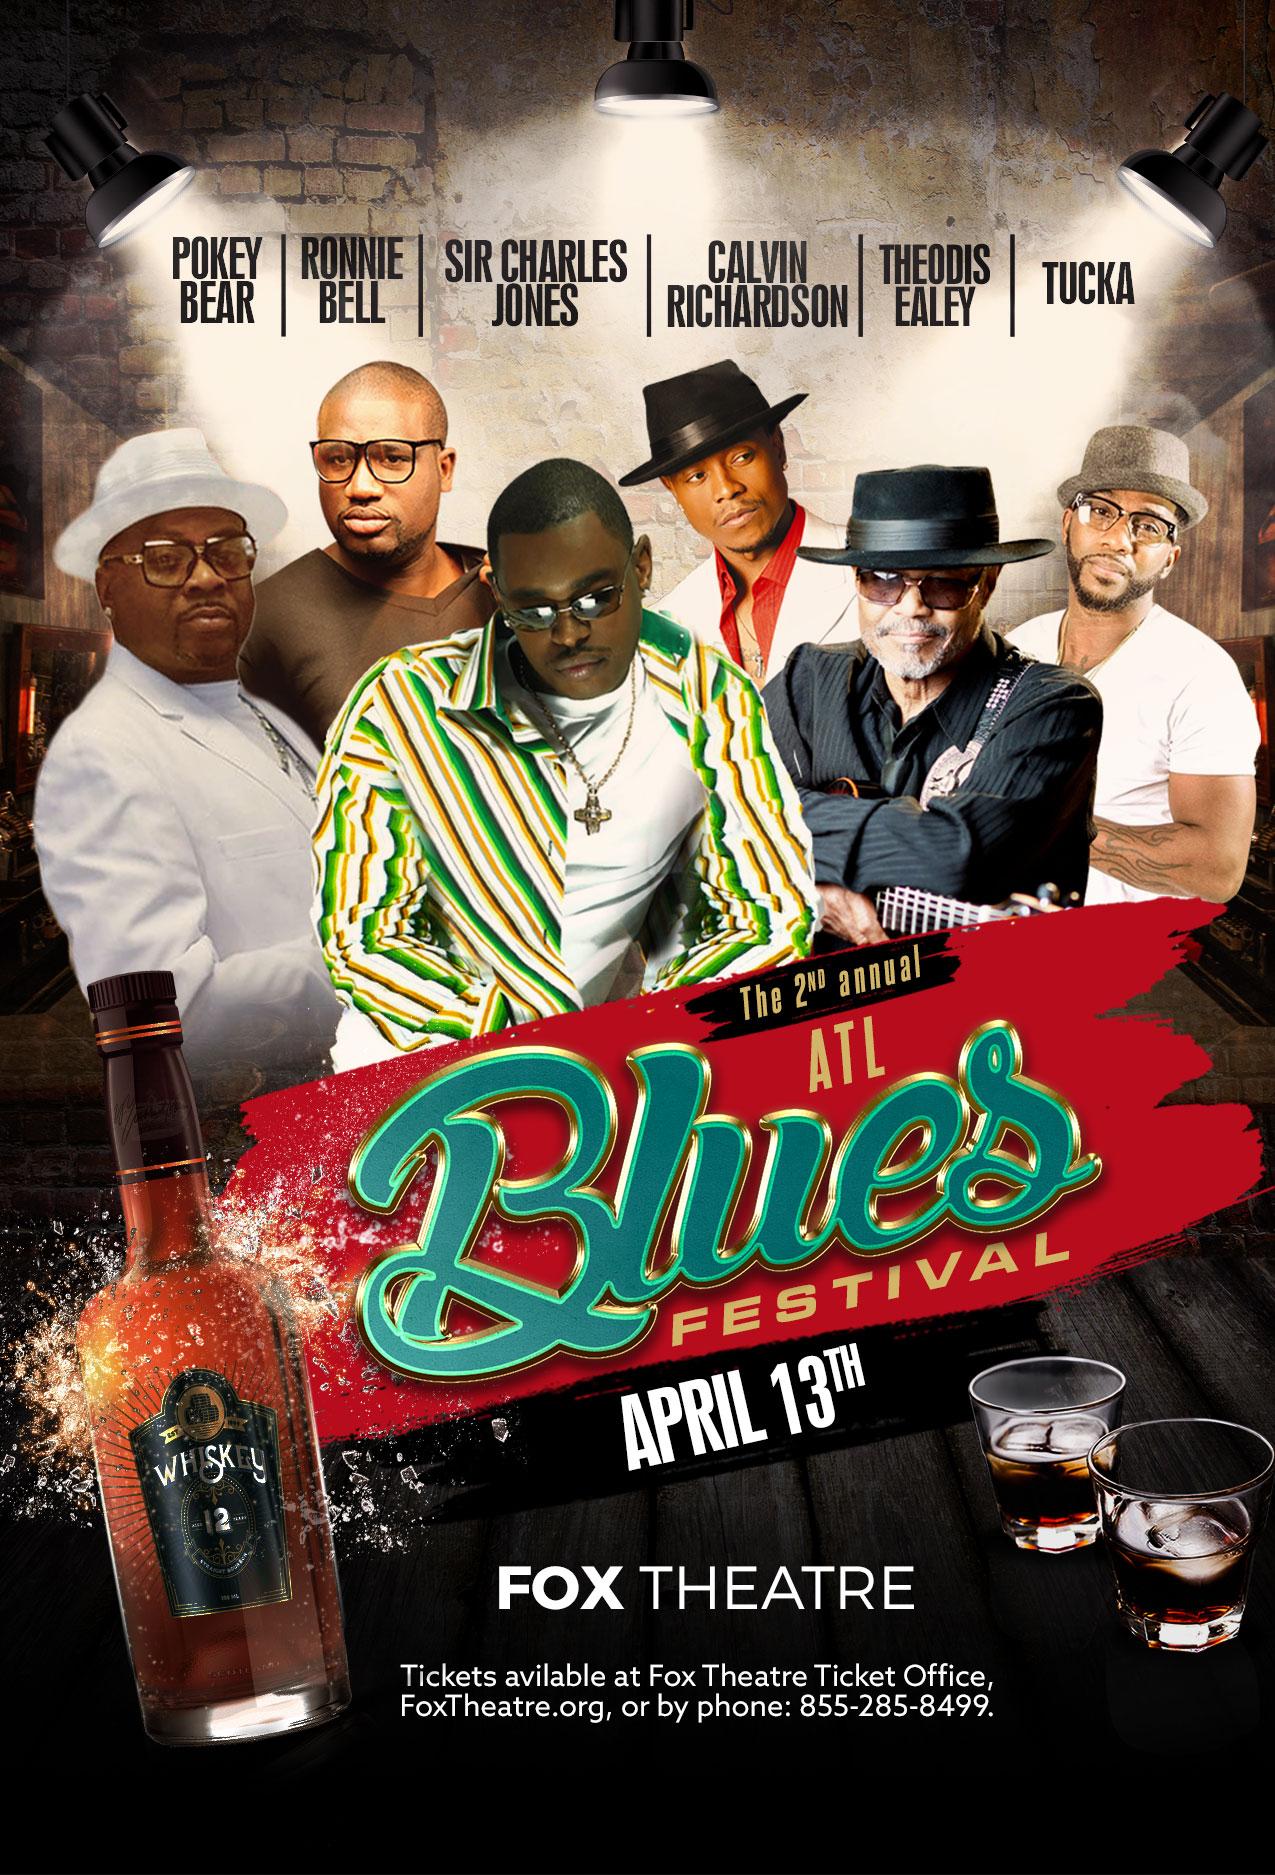 2nd Annual Atlanta Blues Festival